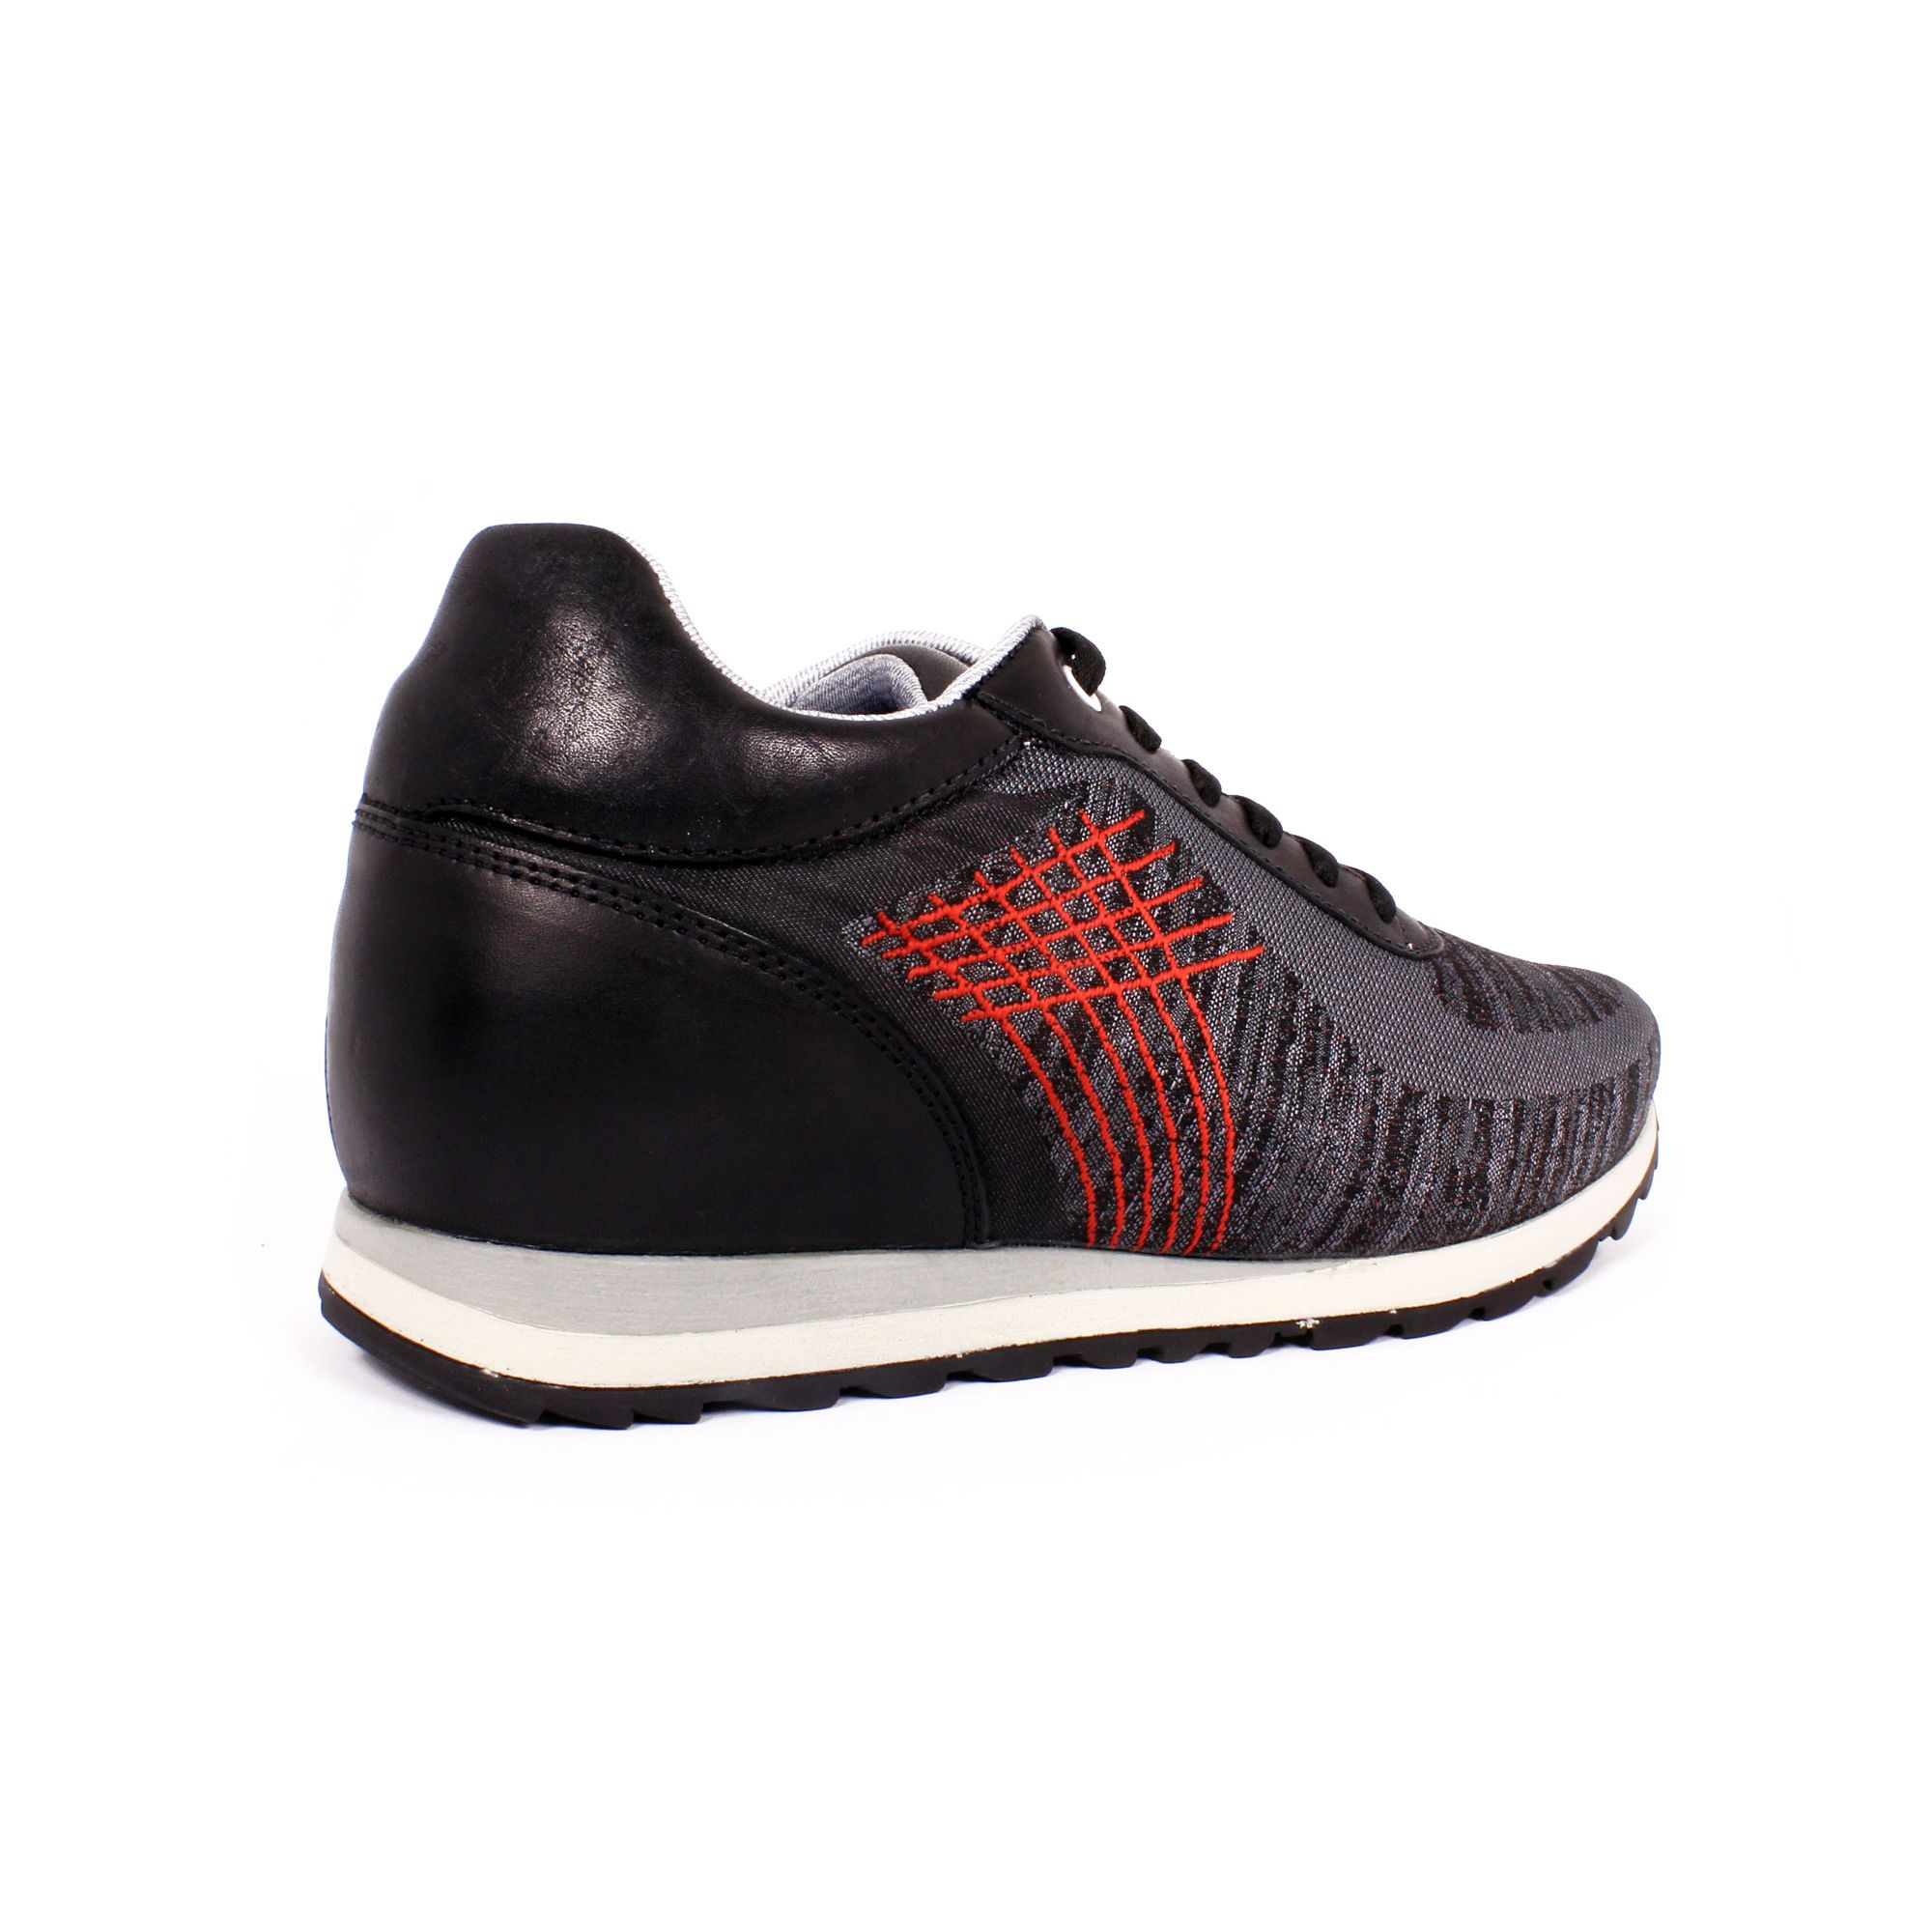 Tenis Extreme Negro Max Denegri +7cm de Altura_70857